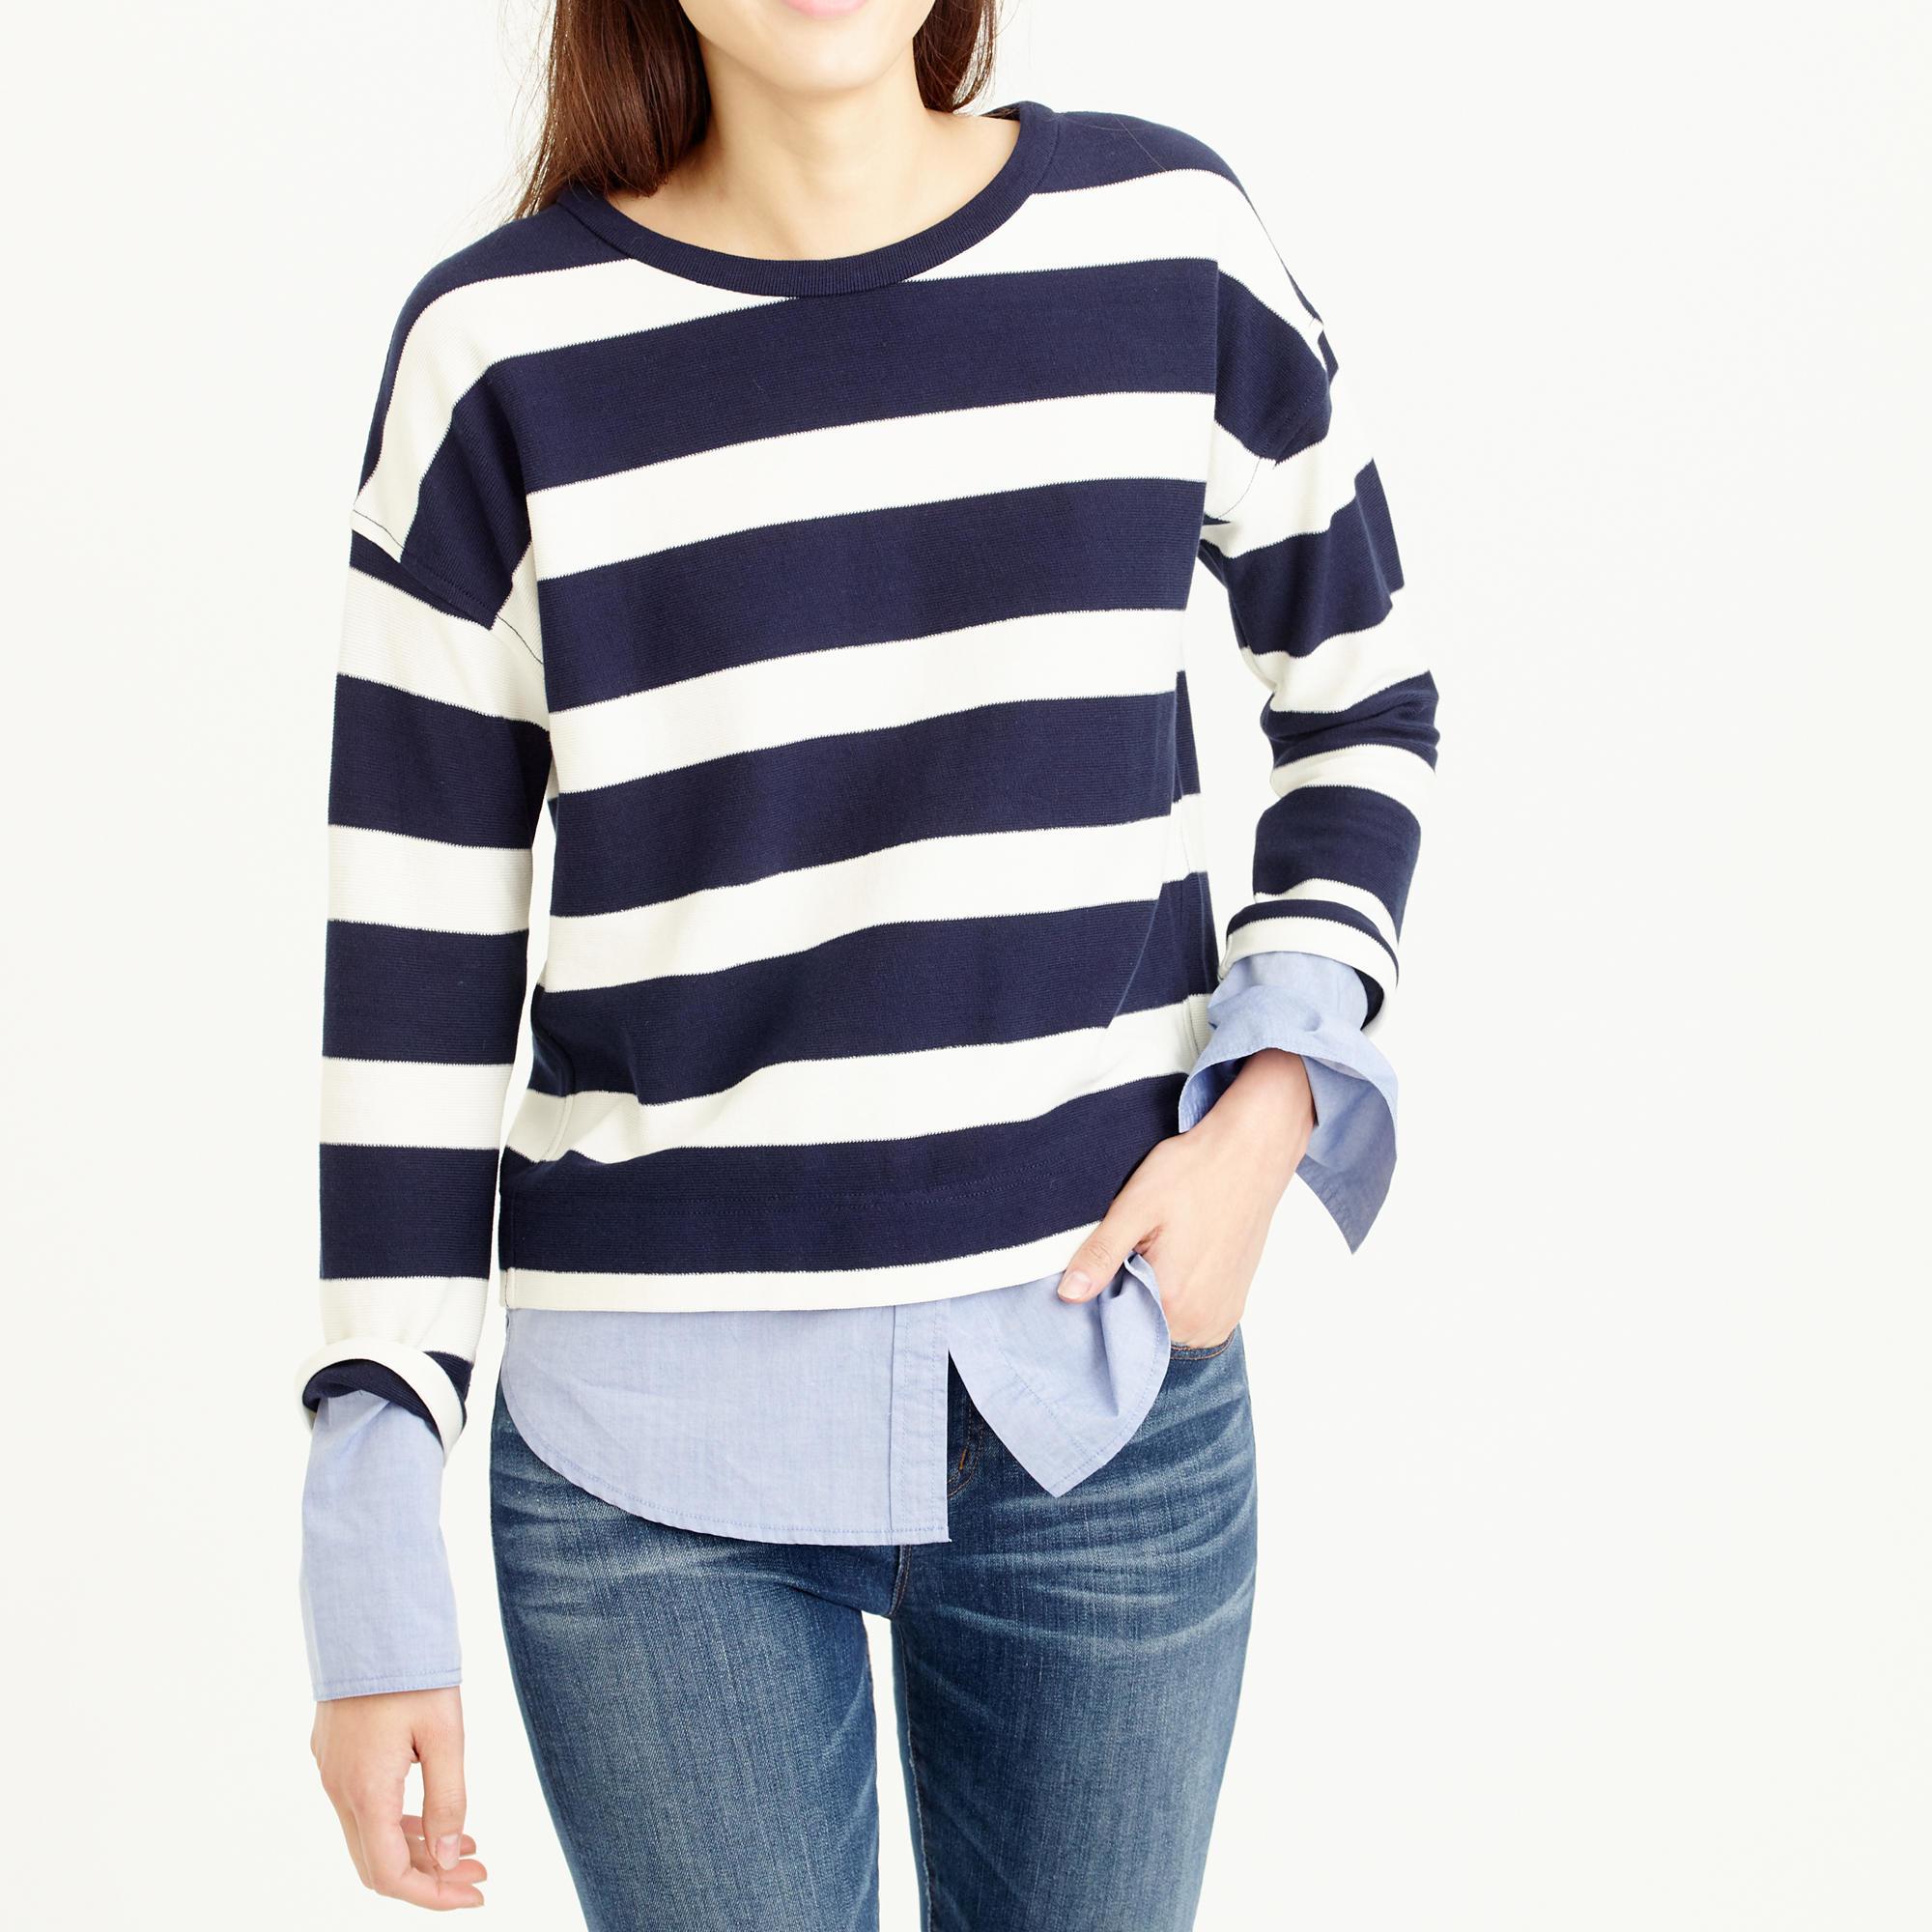 Striped long sleeve t shirt with shirttail hem in for Navy blue striped long sleeve shirt